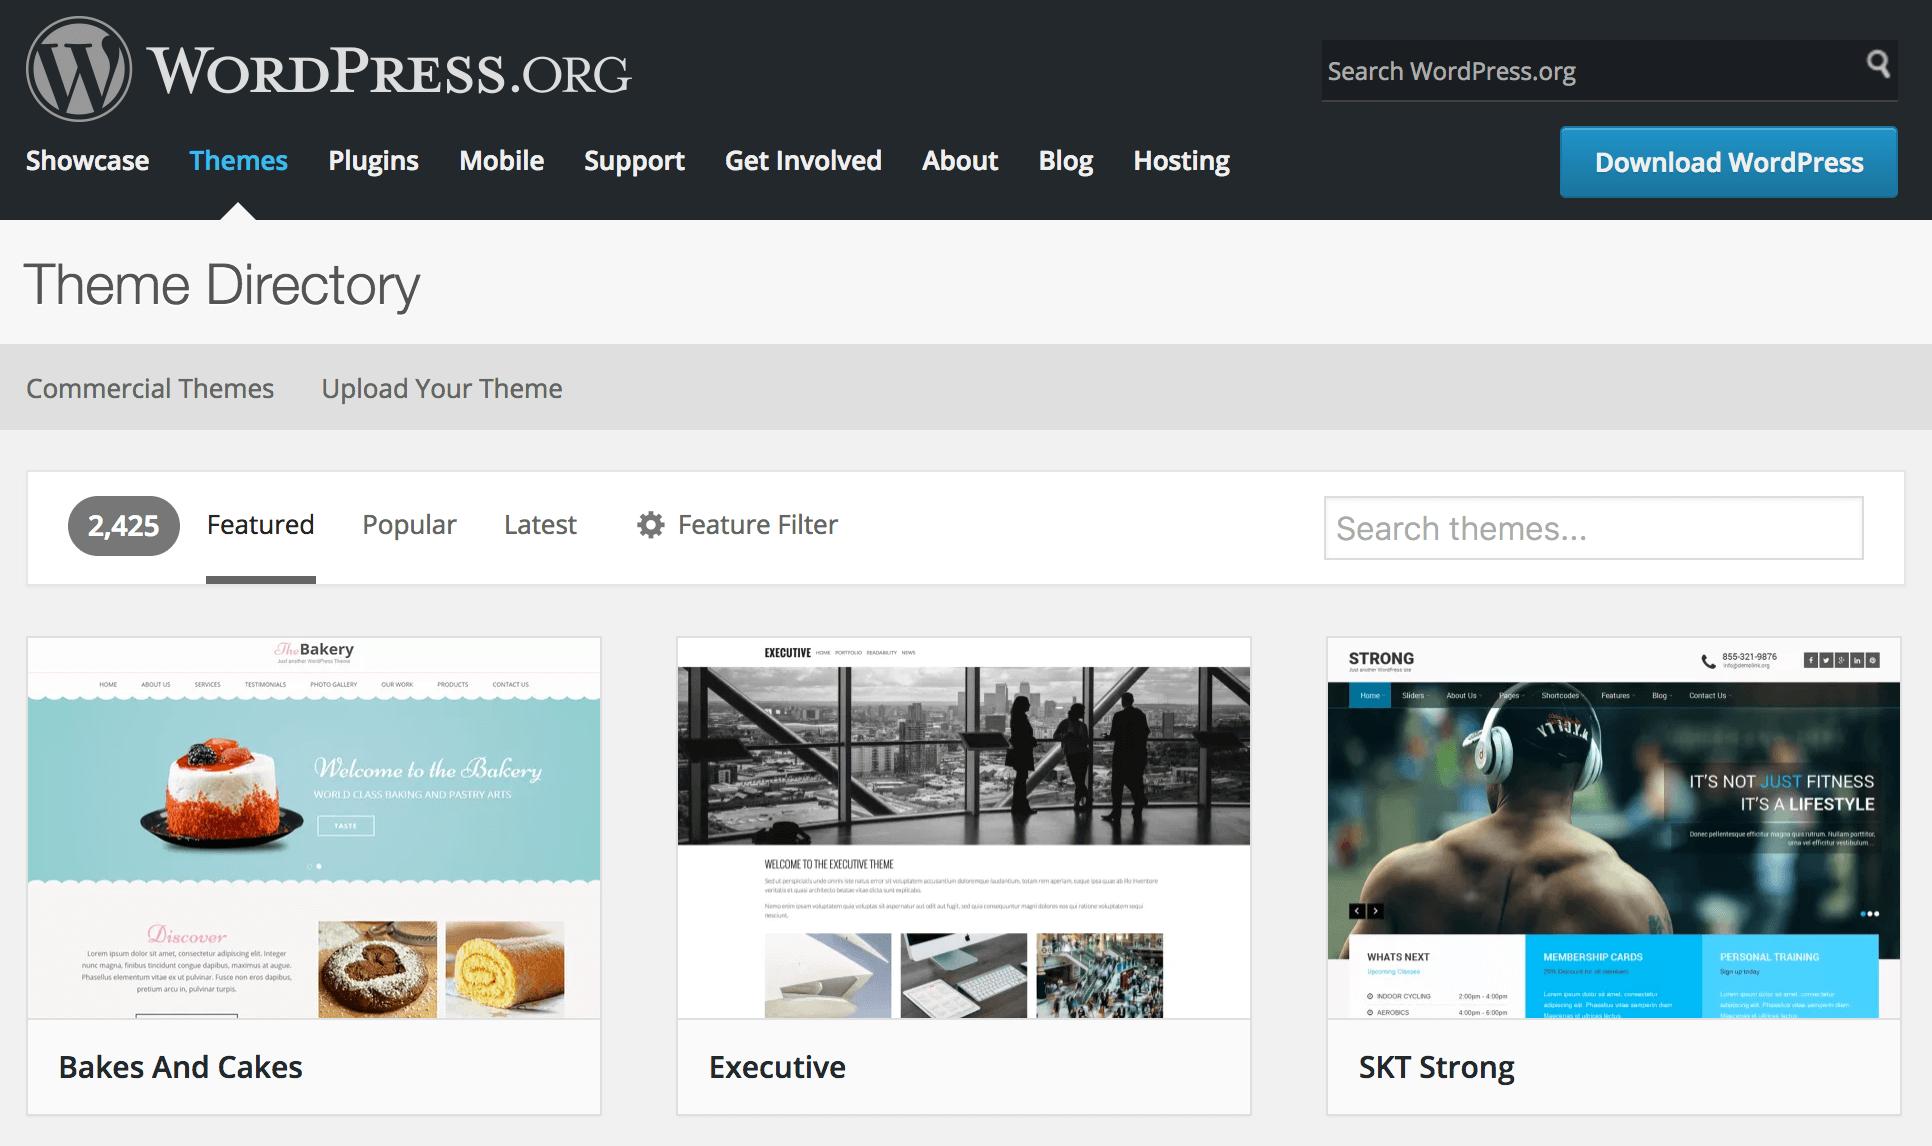 The WordPress.org Theme Directory.